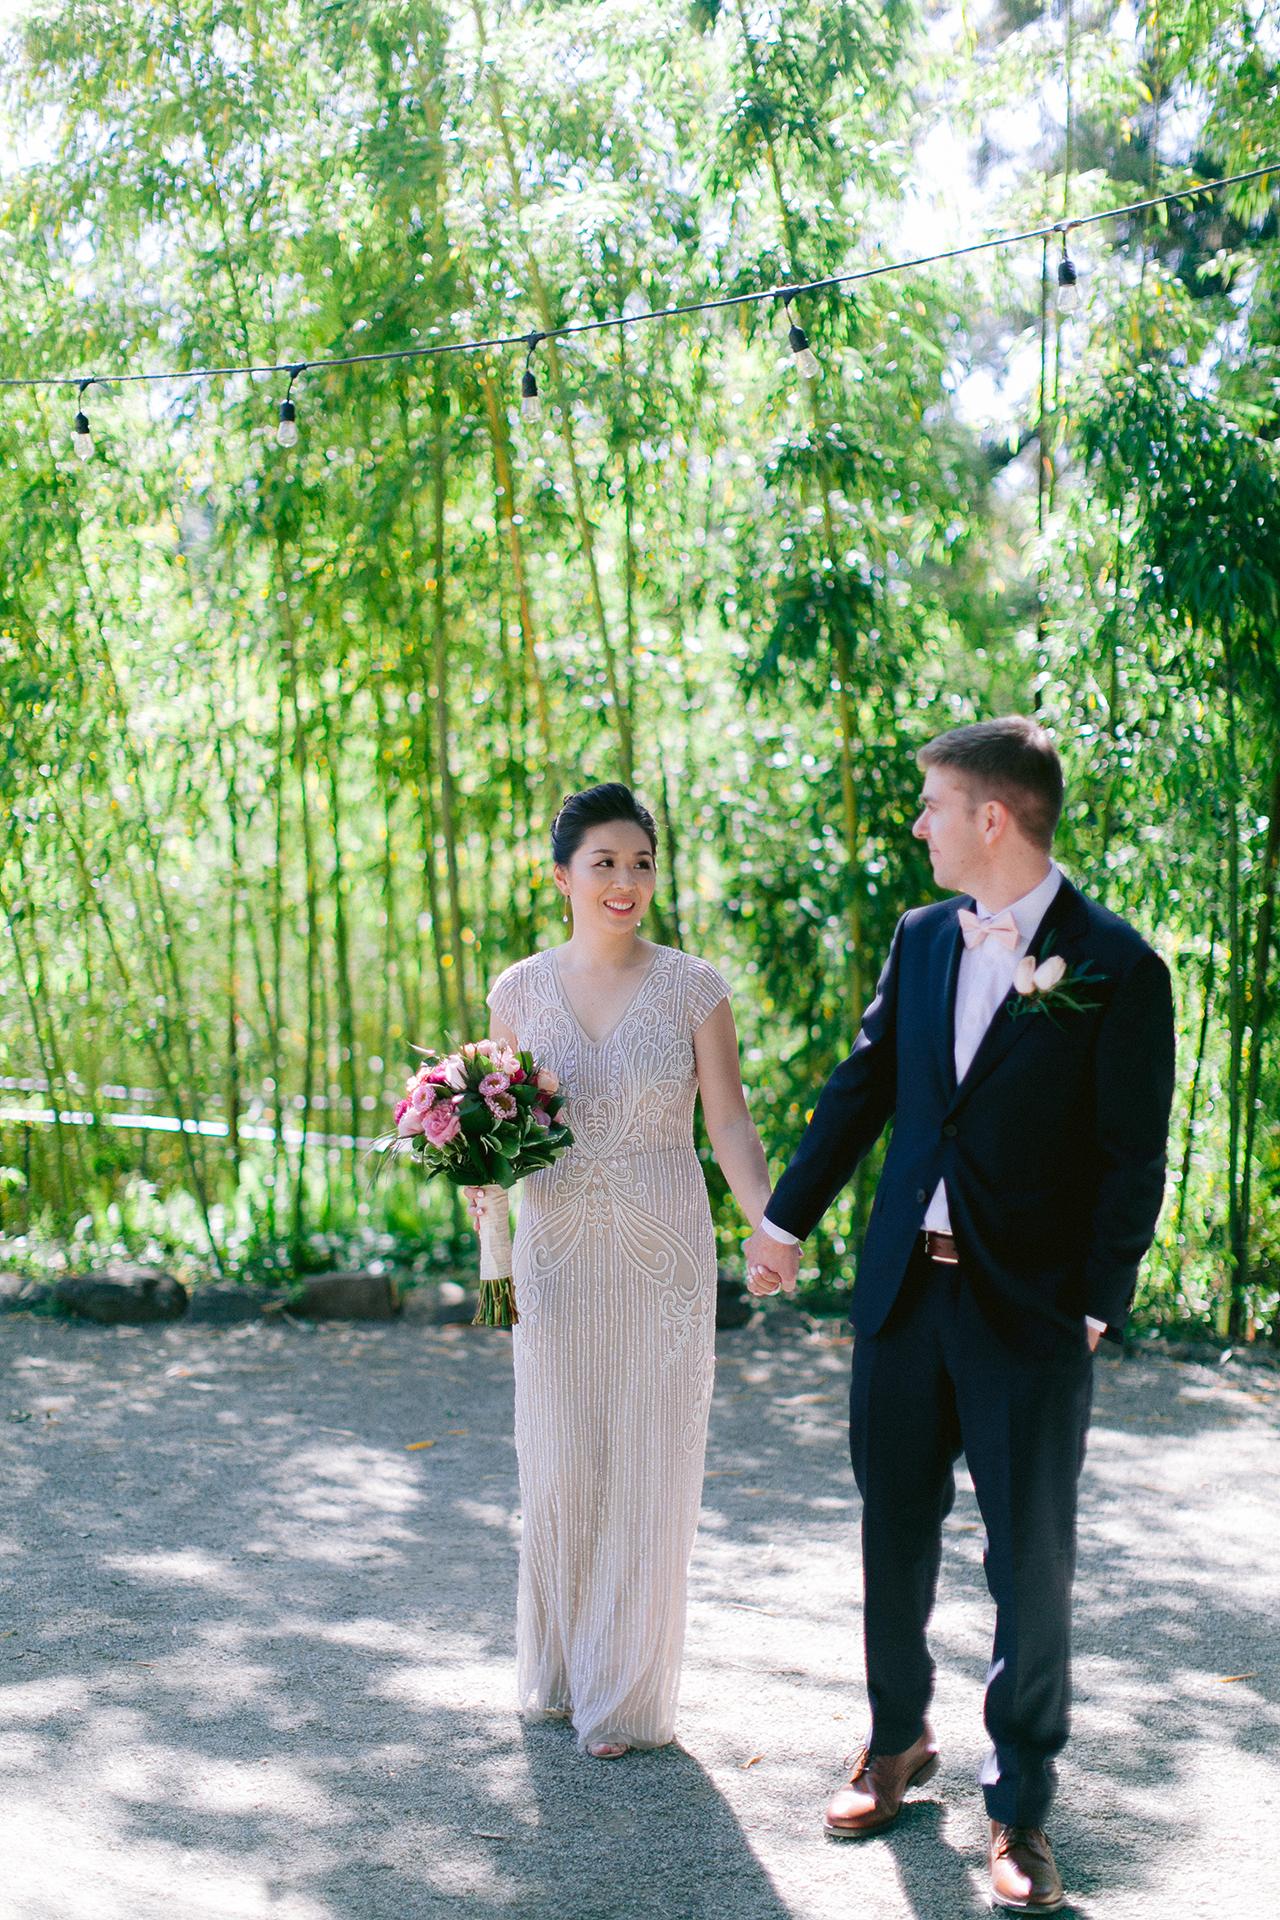 Hakone_Estate_and_Gardens_Wedding_012.jpg